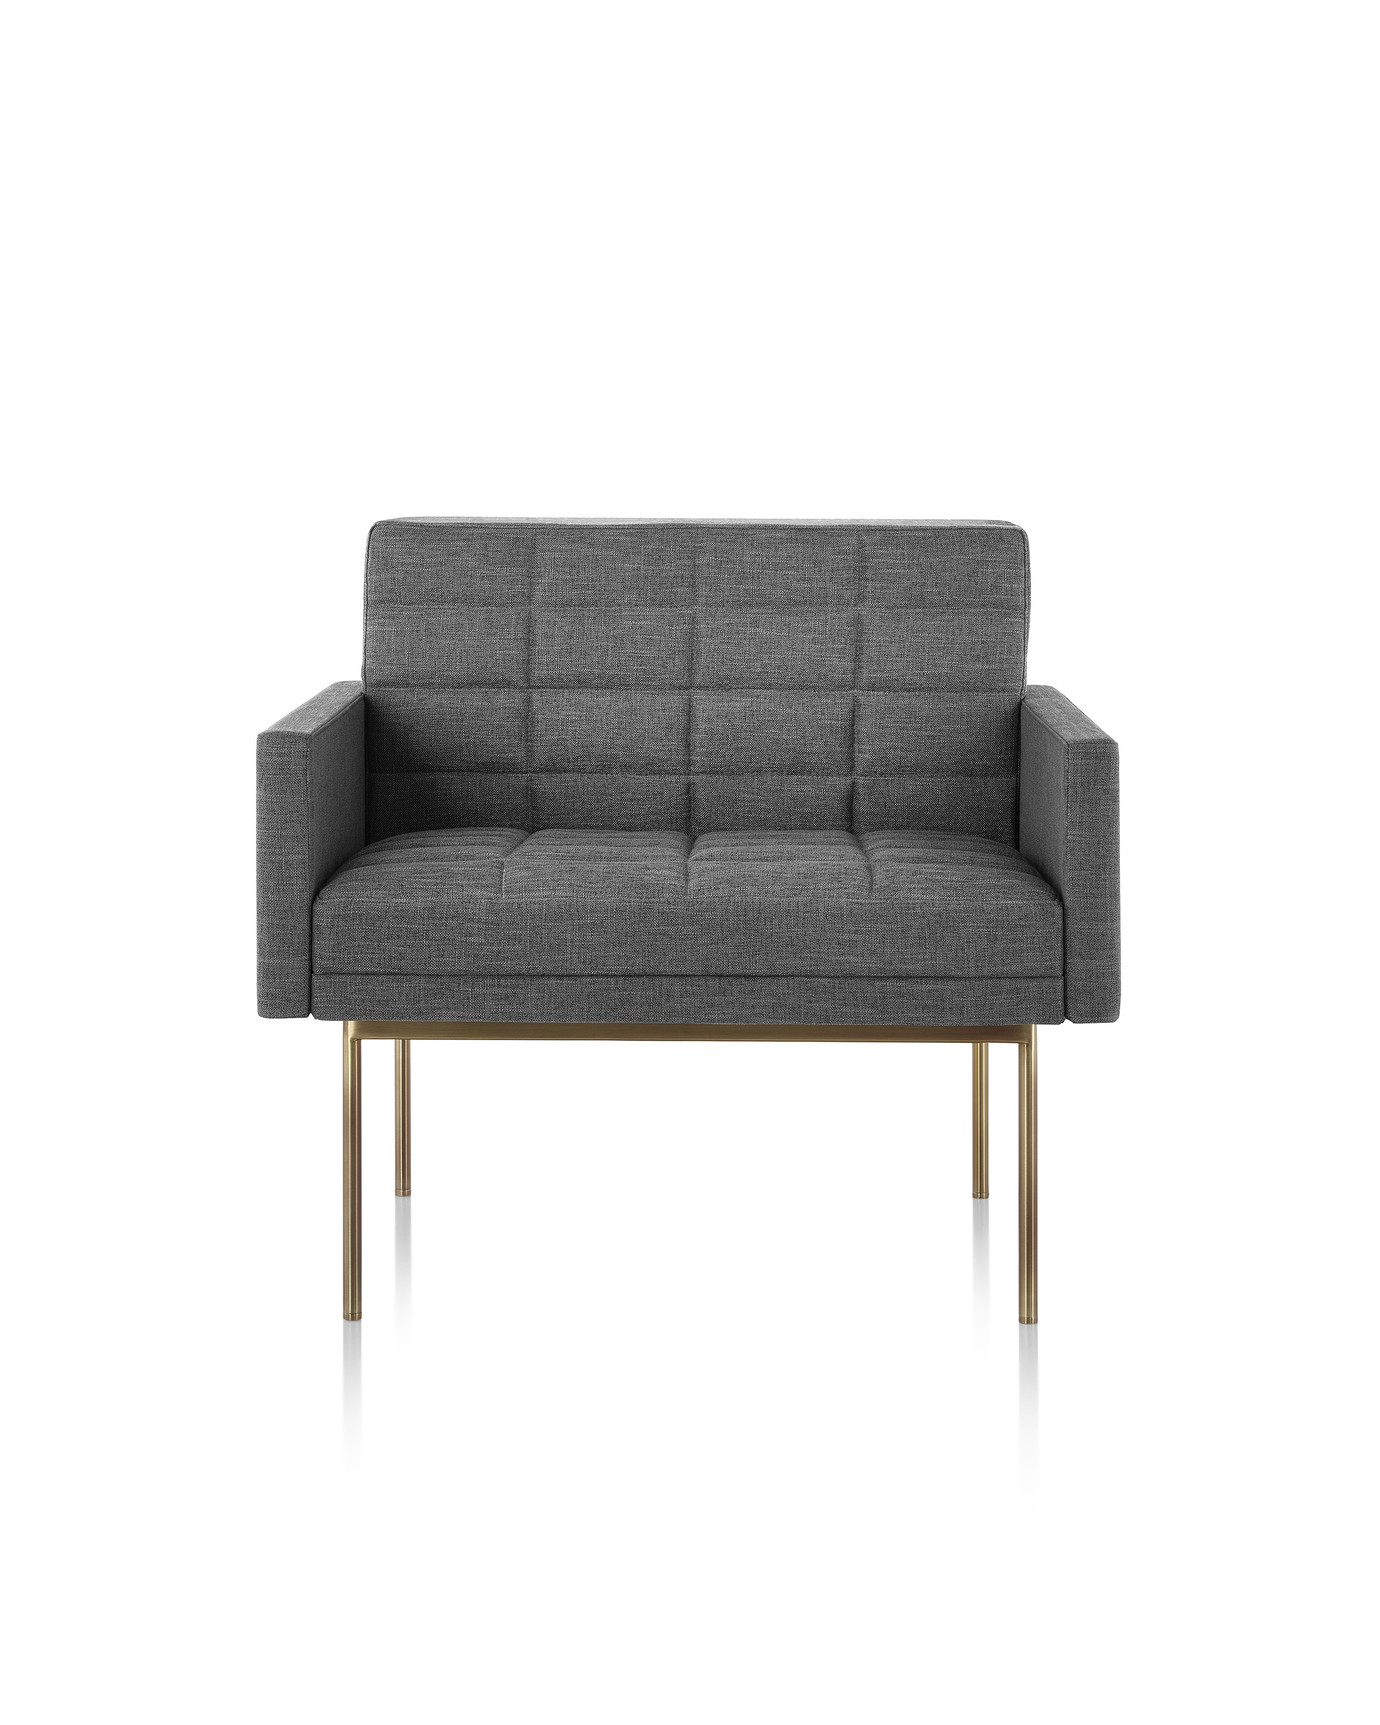 4-Silla-Lounge-Tuxedo-Frontal-1380